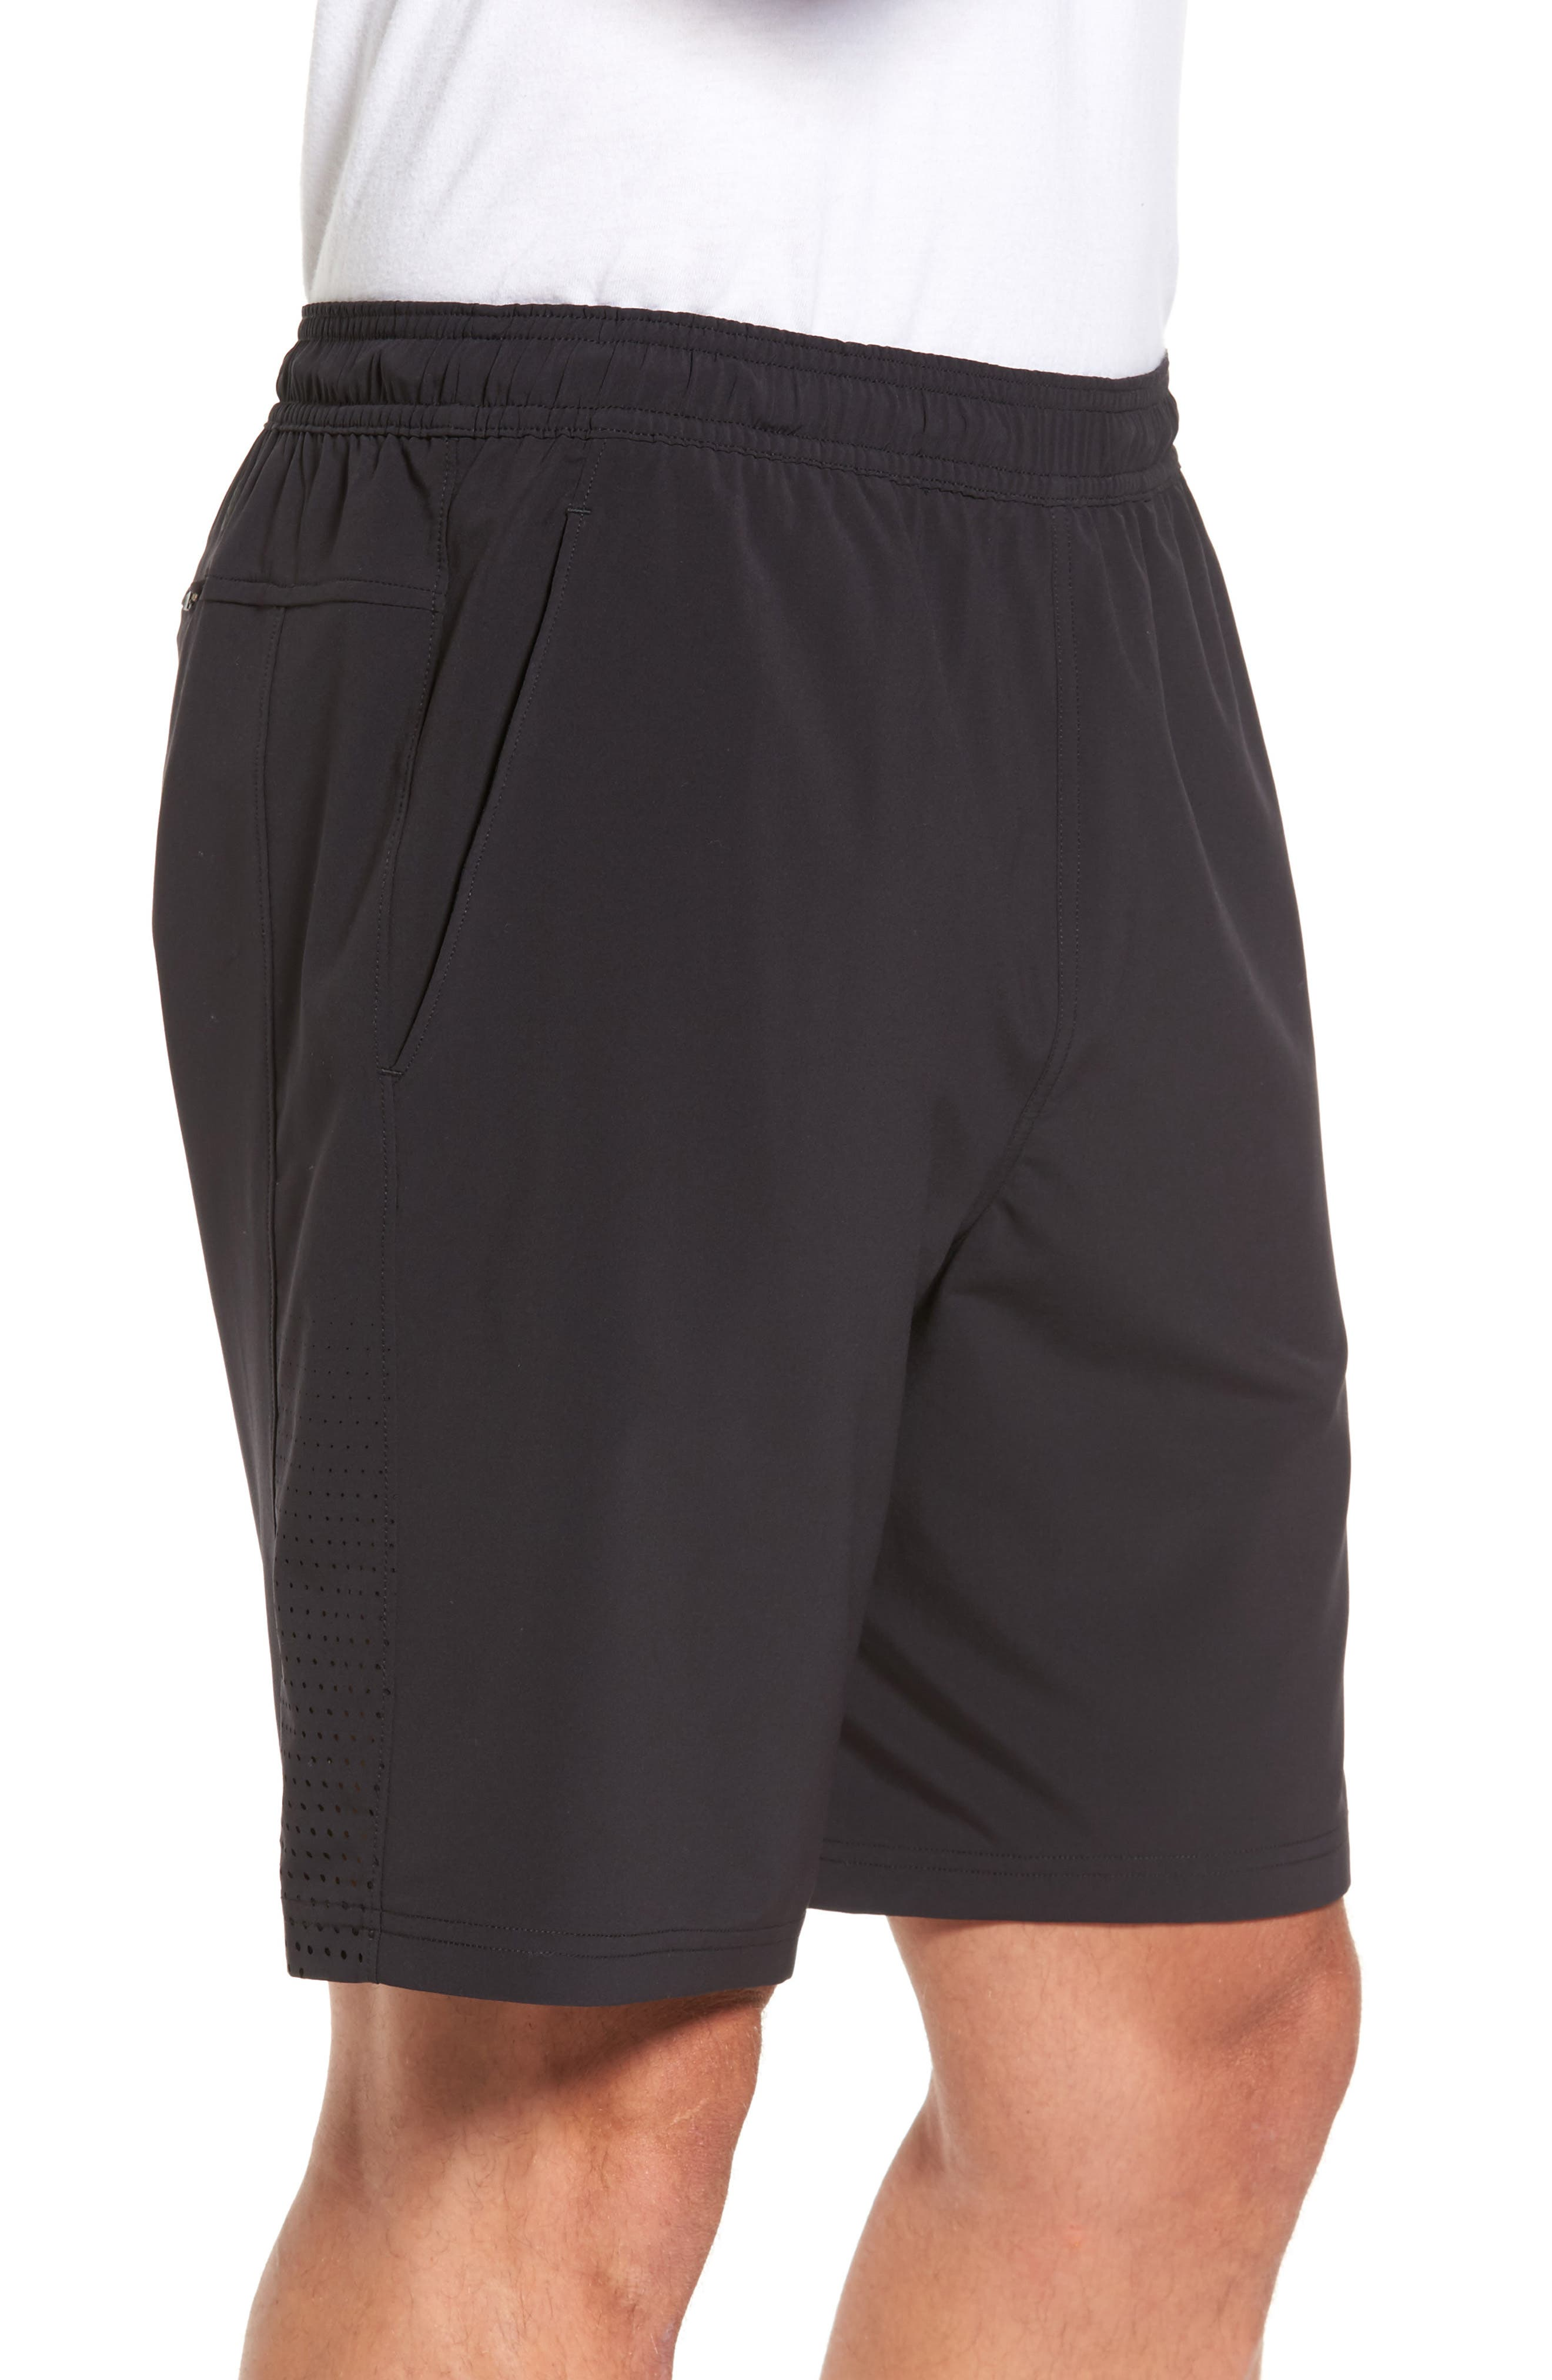 Alternate Image 3  - Zella Graphite Core Athletic Shorts